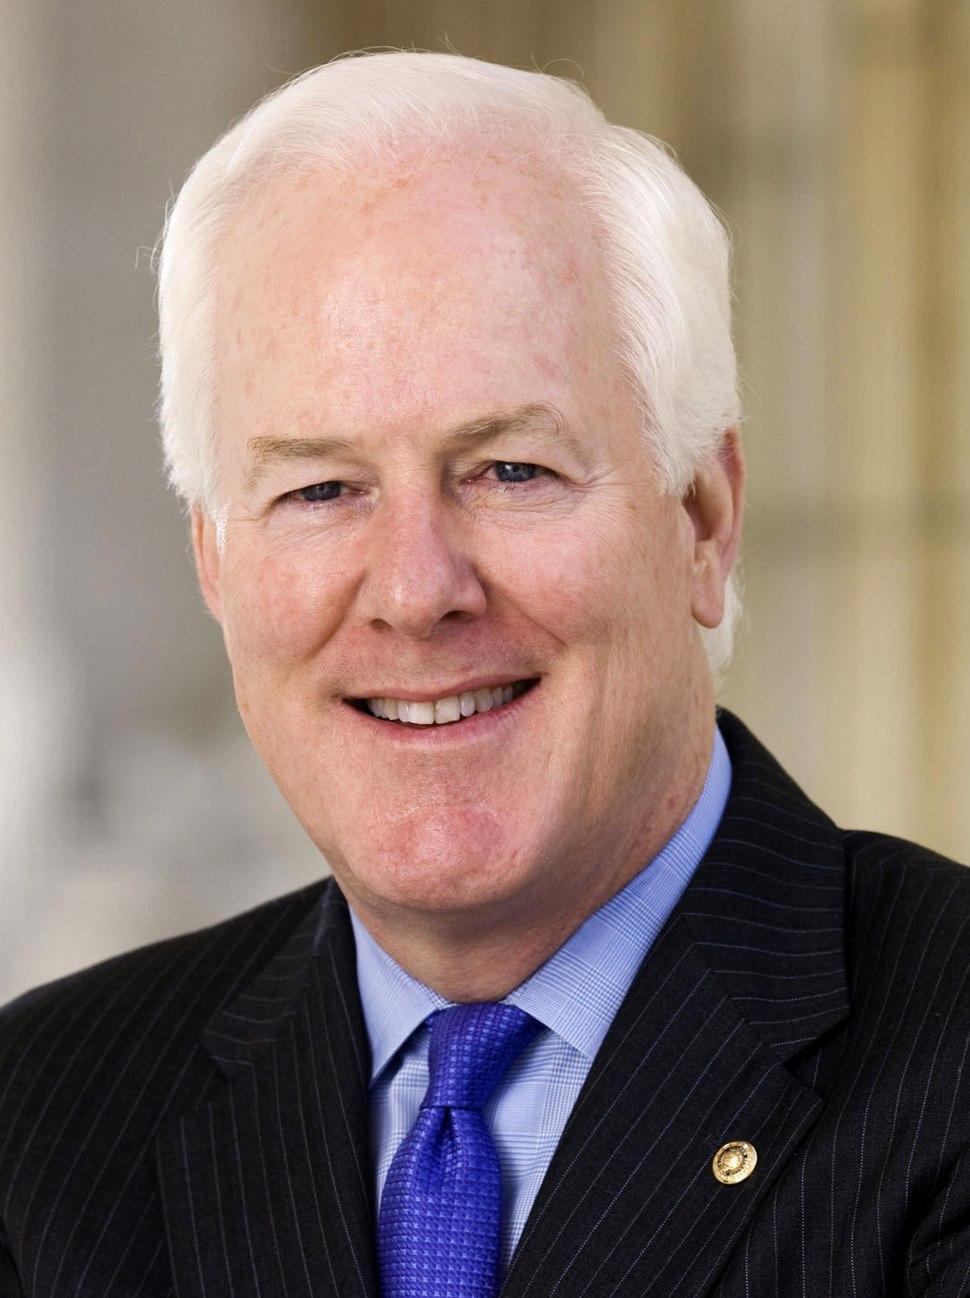 John Cornyn official portrait, 2009 (cropped)